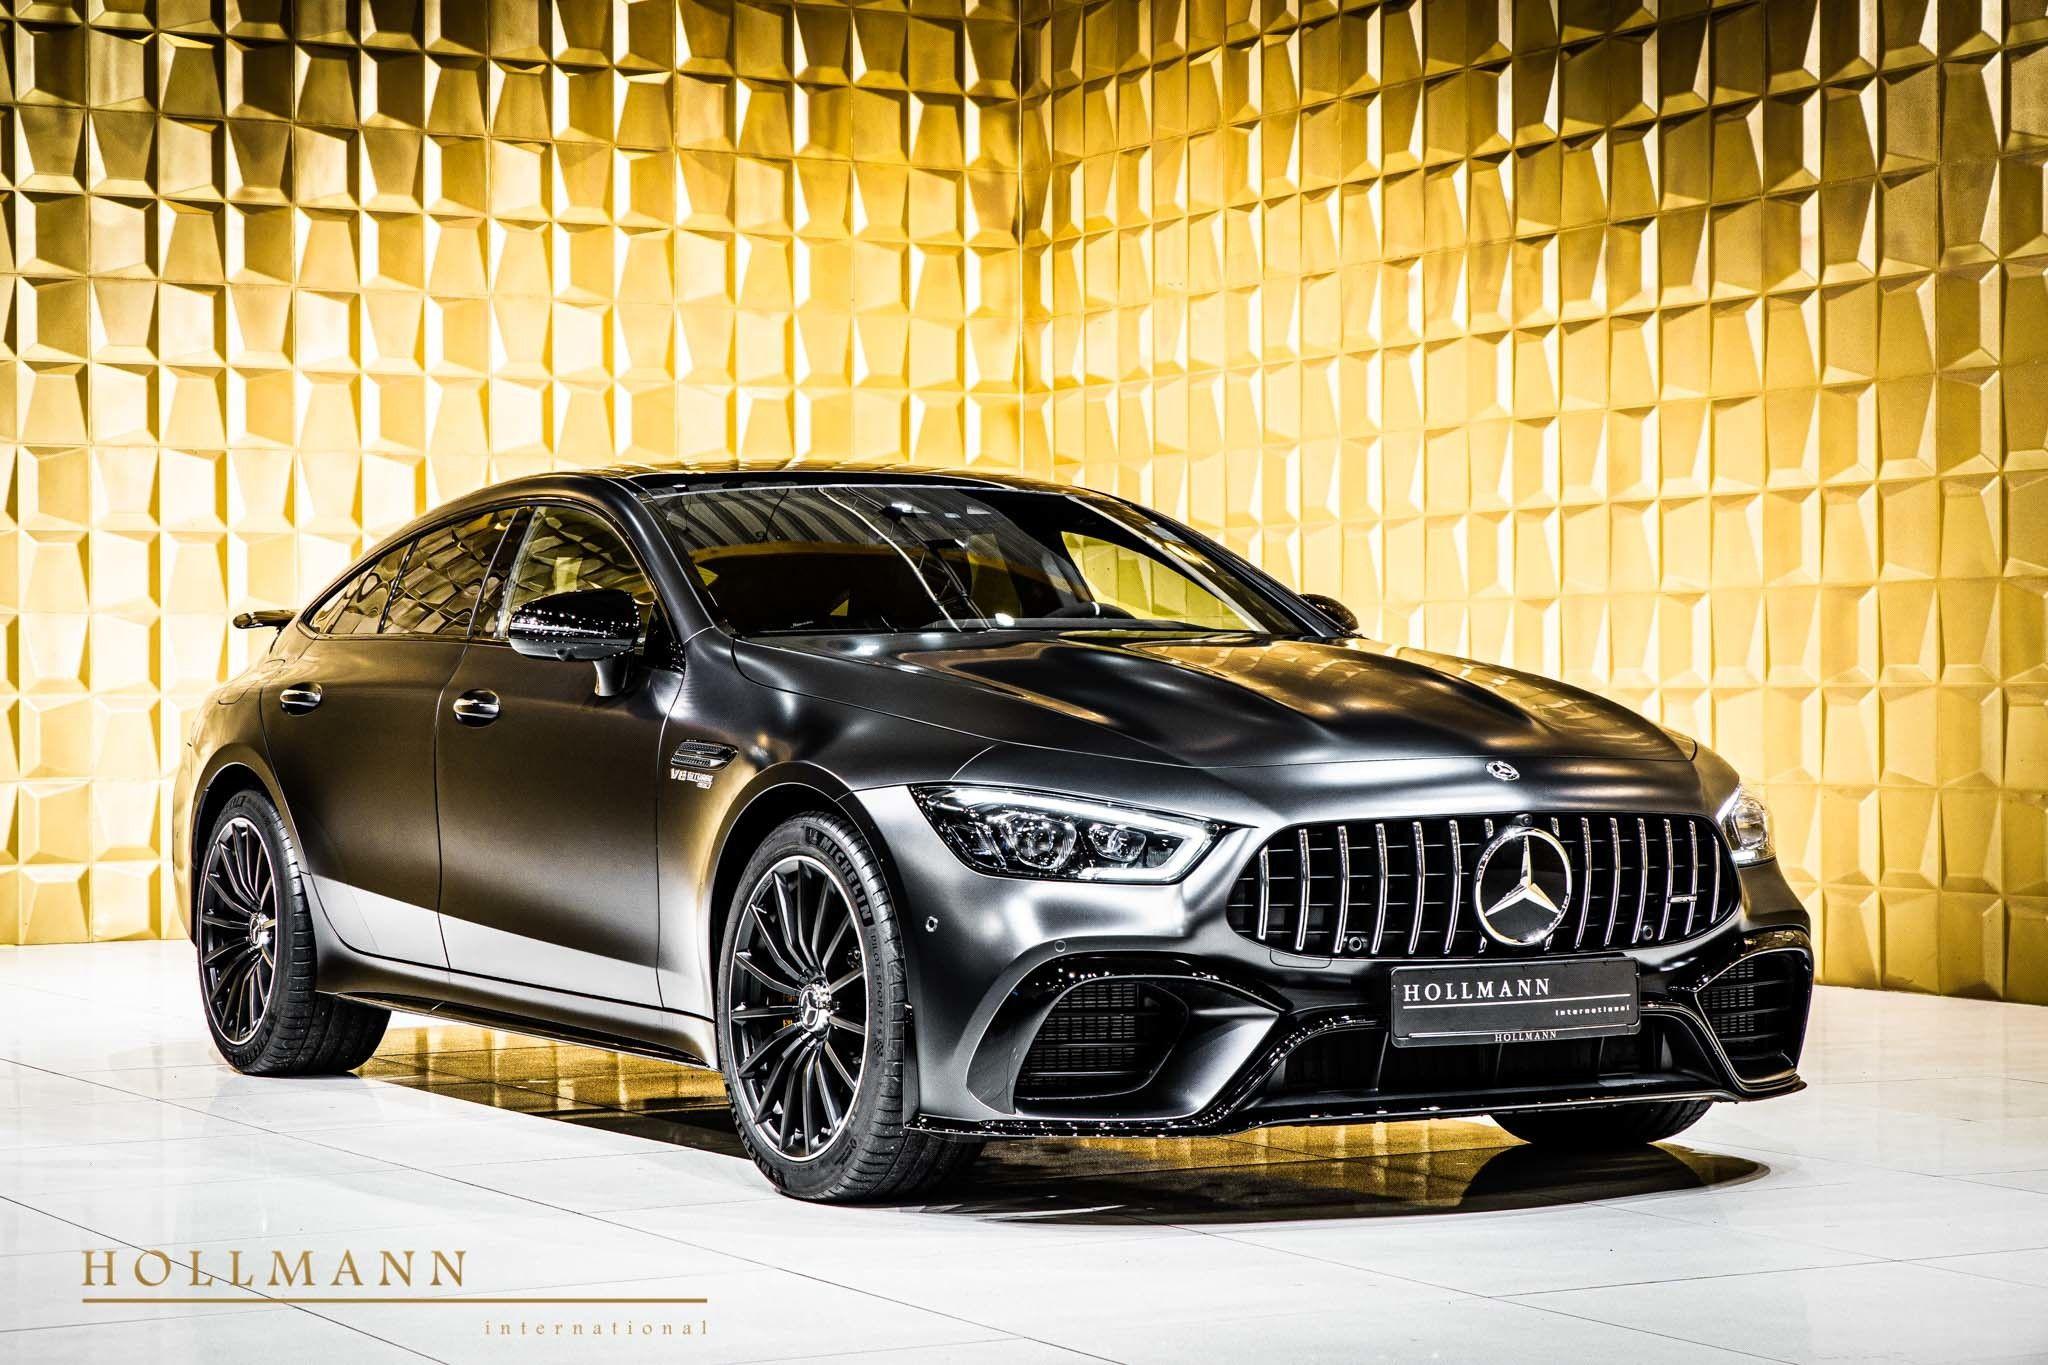 Mercedes Benz Amg Gt 63 S 4m Hollmann International Germany For Sale On Luxurypulse In 2021 Mercedes Benz Amg Gt Mercedes Benz Amg Mercedes Benz